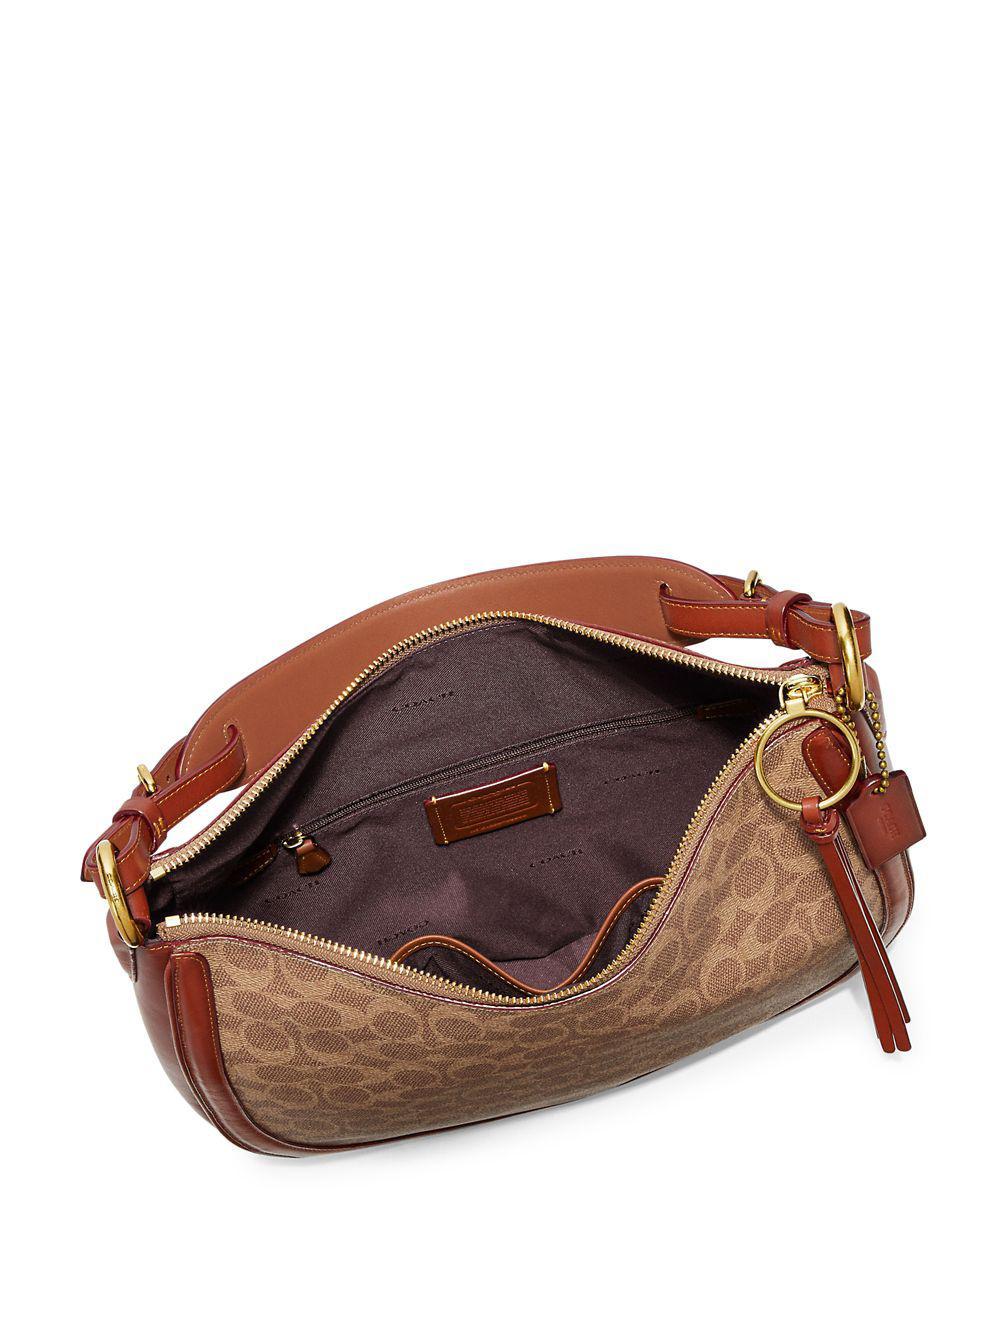 ... buy coach natural signature canvas and leather sutton hobo bag lyst.  view fullscreen c0b70 6e698 fcfc522434e7a